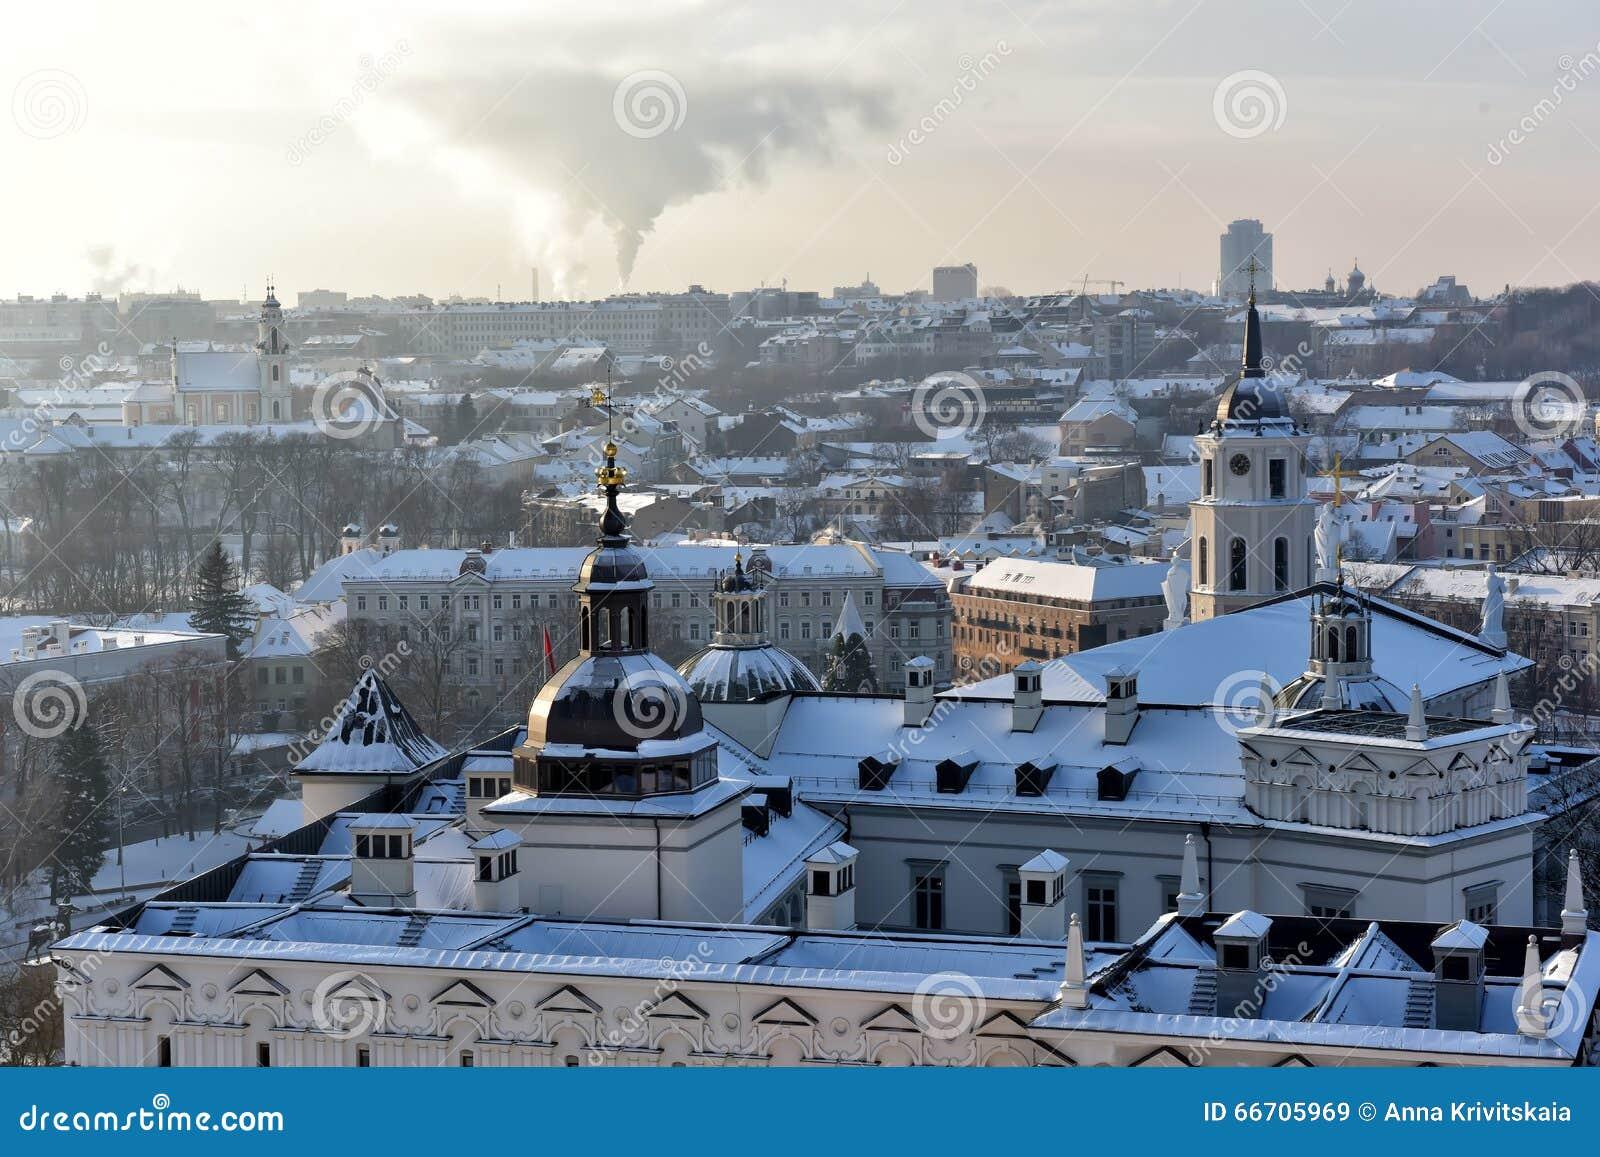 Vilnius roofs winter view